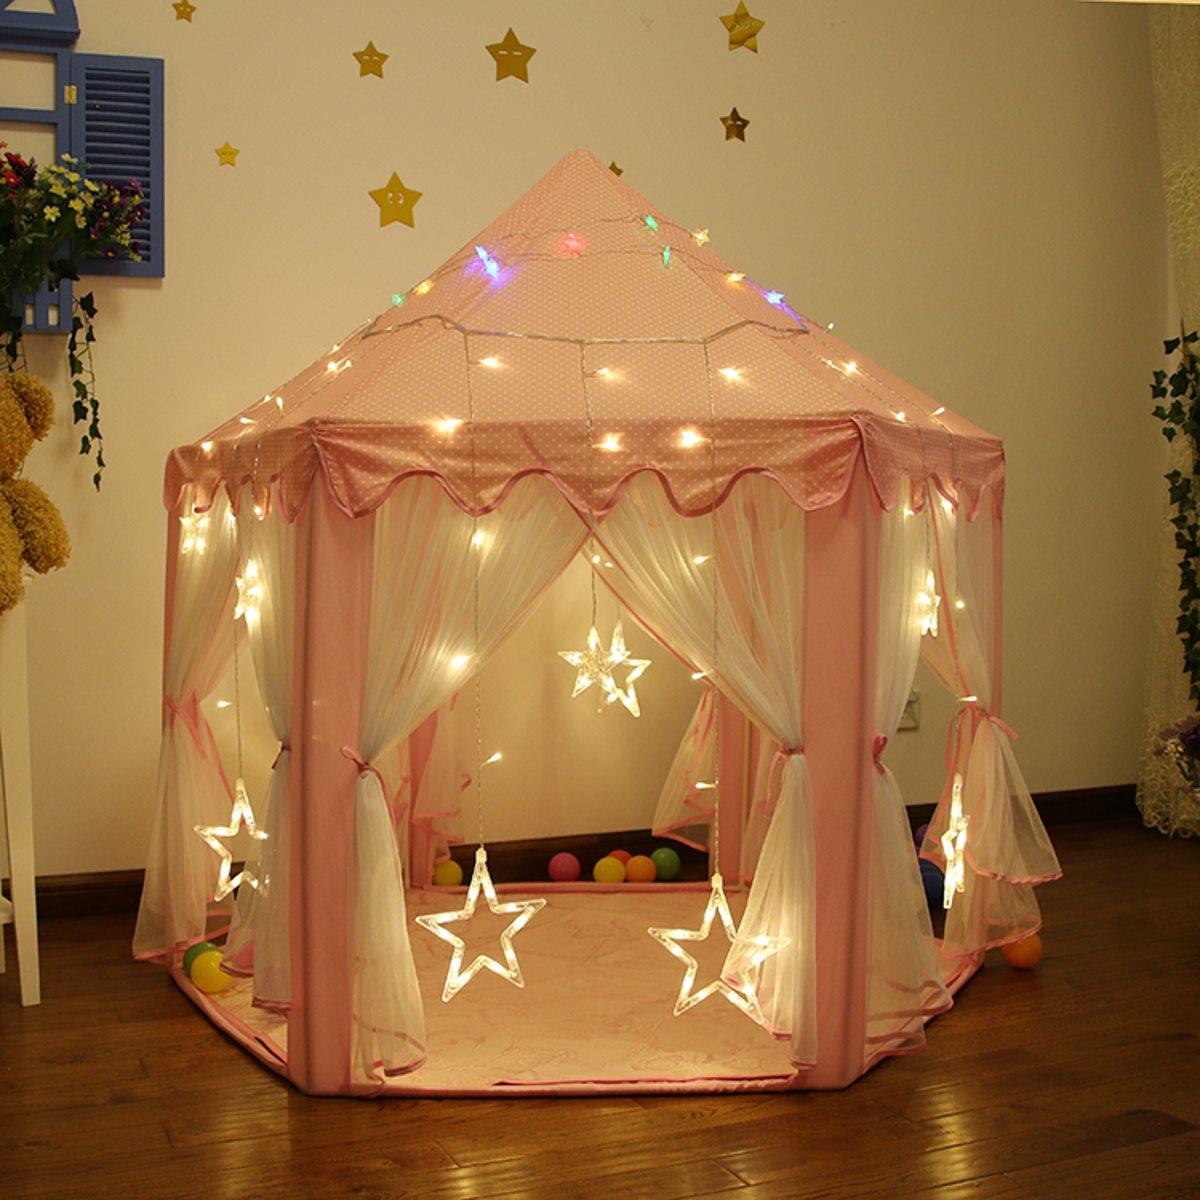 jugar castillo princesa carpa porttil con luz led de actividades para nios de hadas casa juega